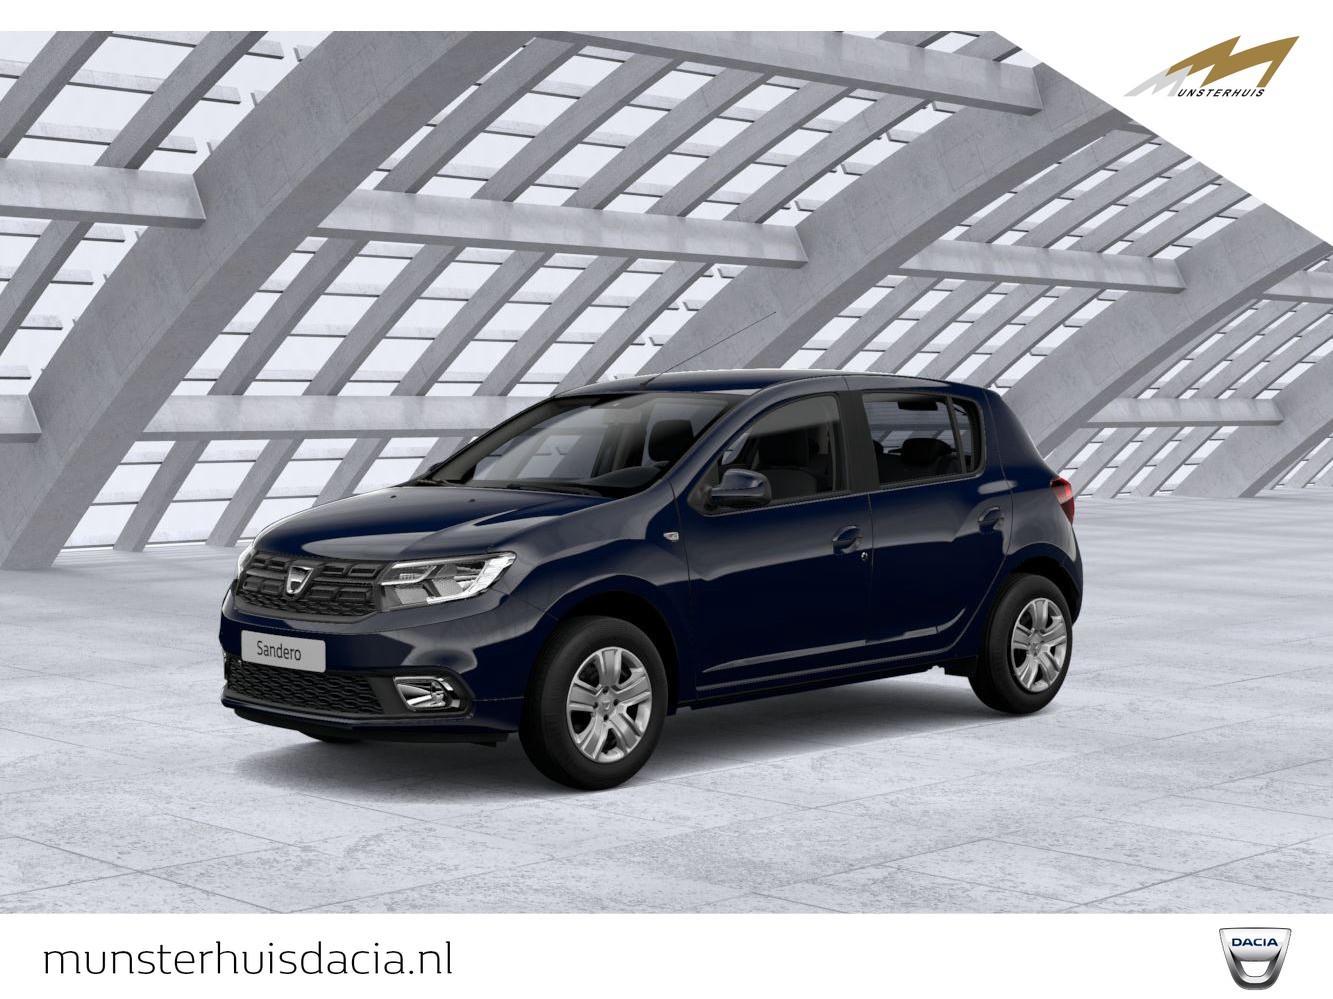 Dacia Sandero Sce 70 laureate